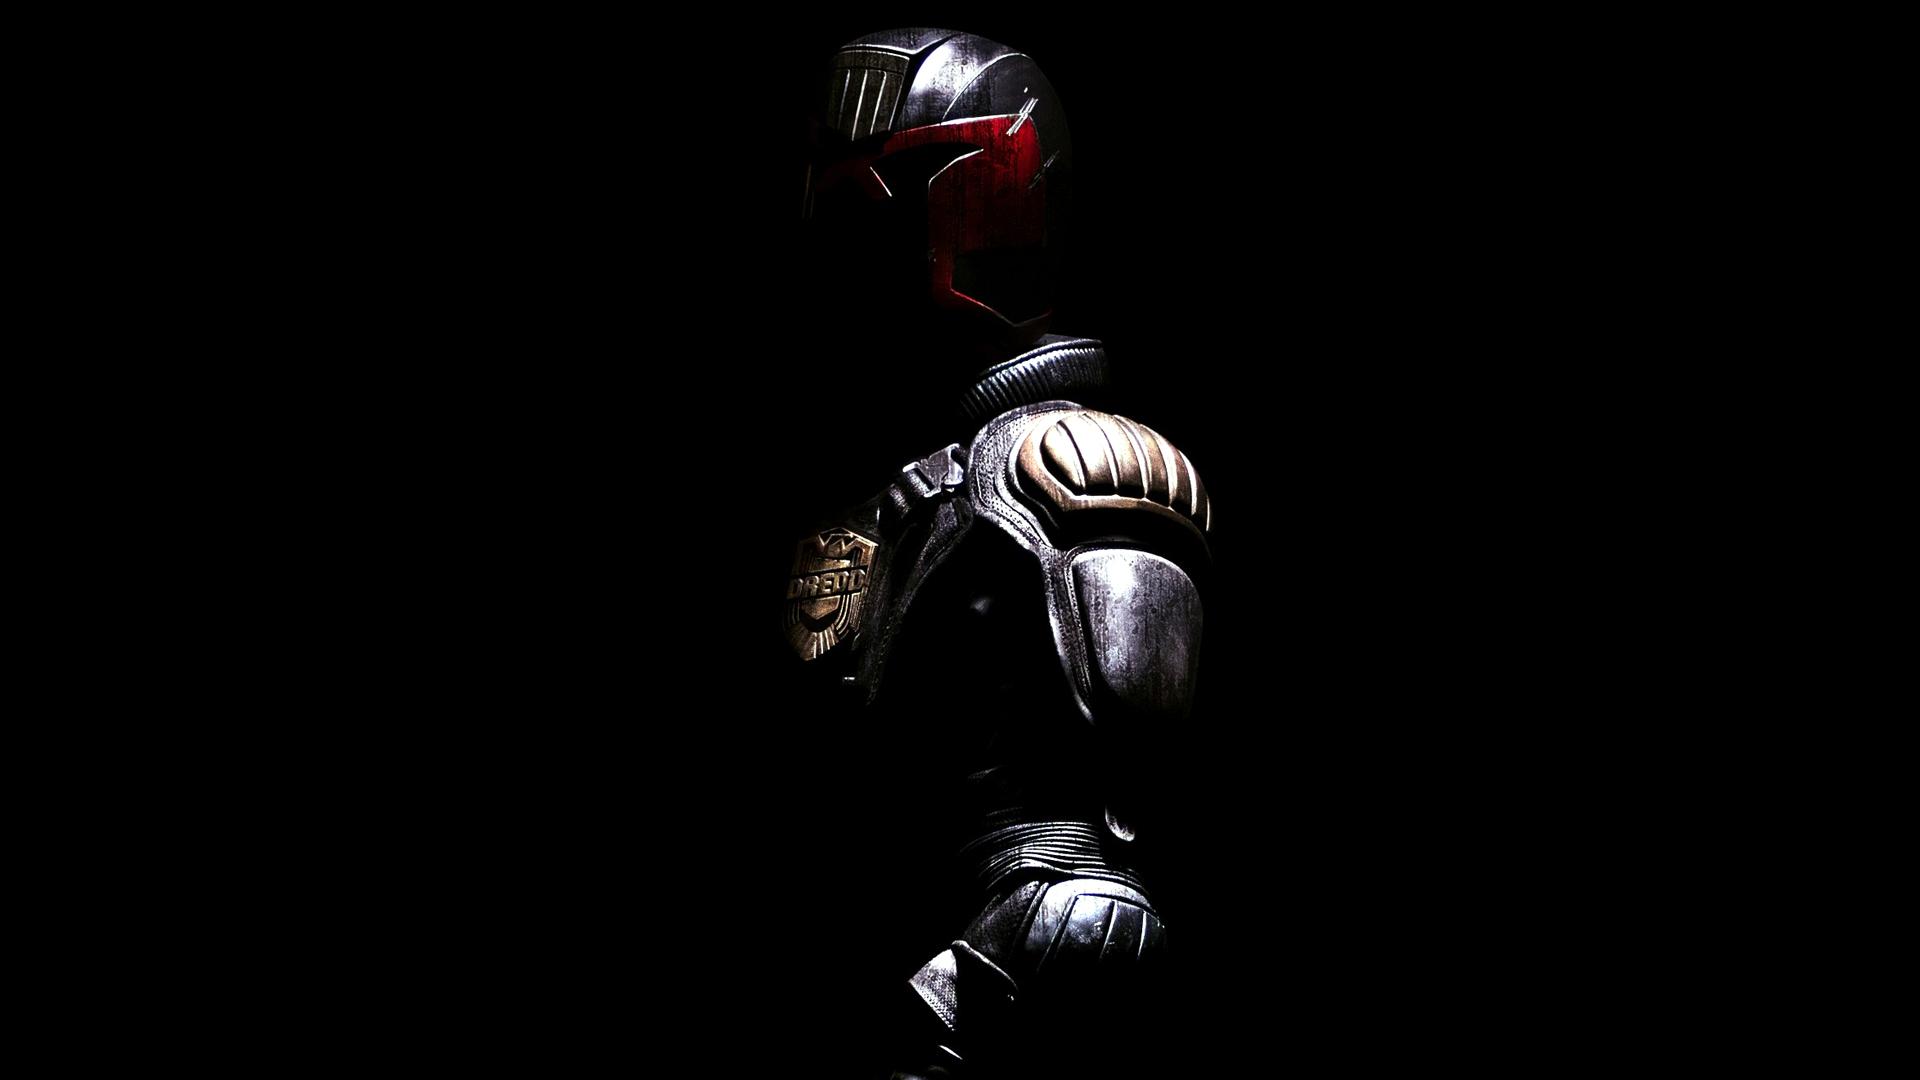 Dredd movies action superhero wallpaper 1920x1080 101795 1920x1080